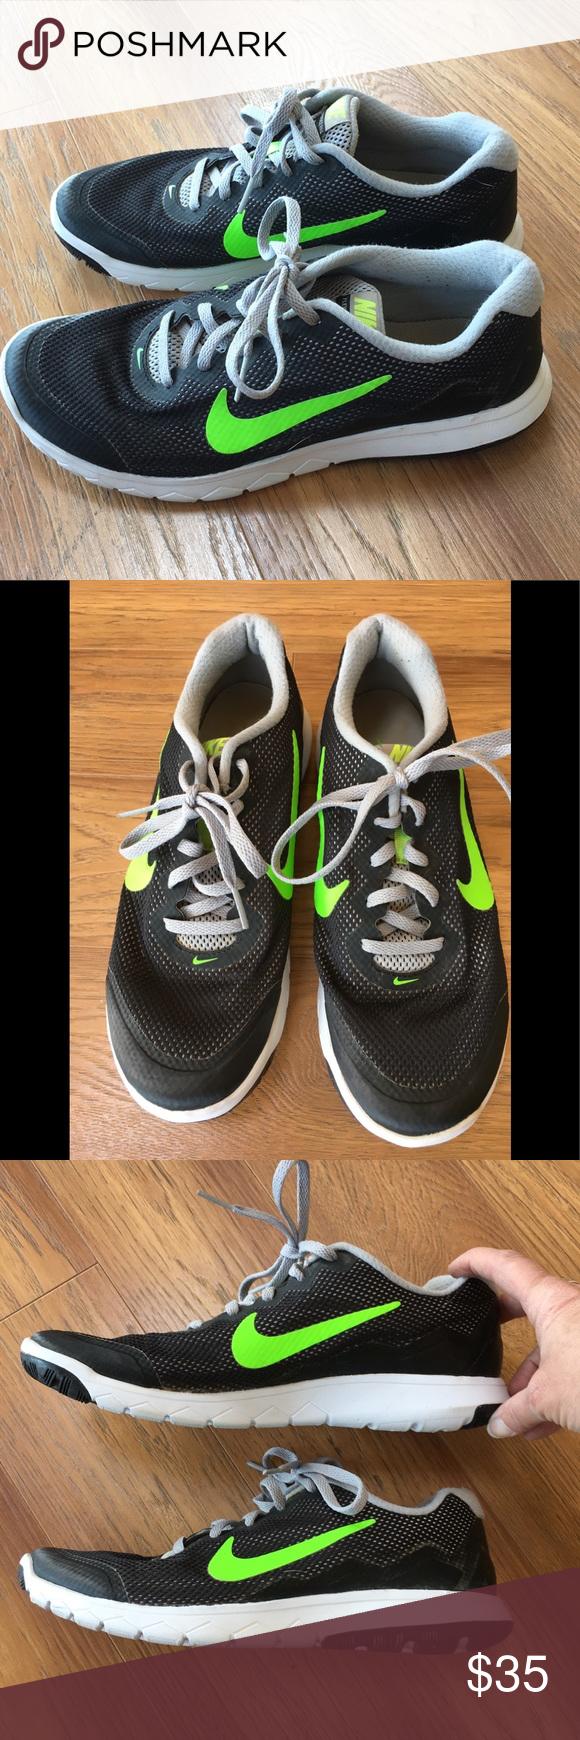 4846e89c1f58 ... greece nike flex experience rn4 black yellow nike flex experience rn4  running shoe in black and